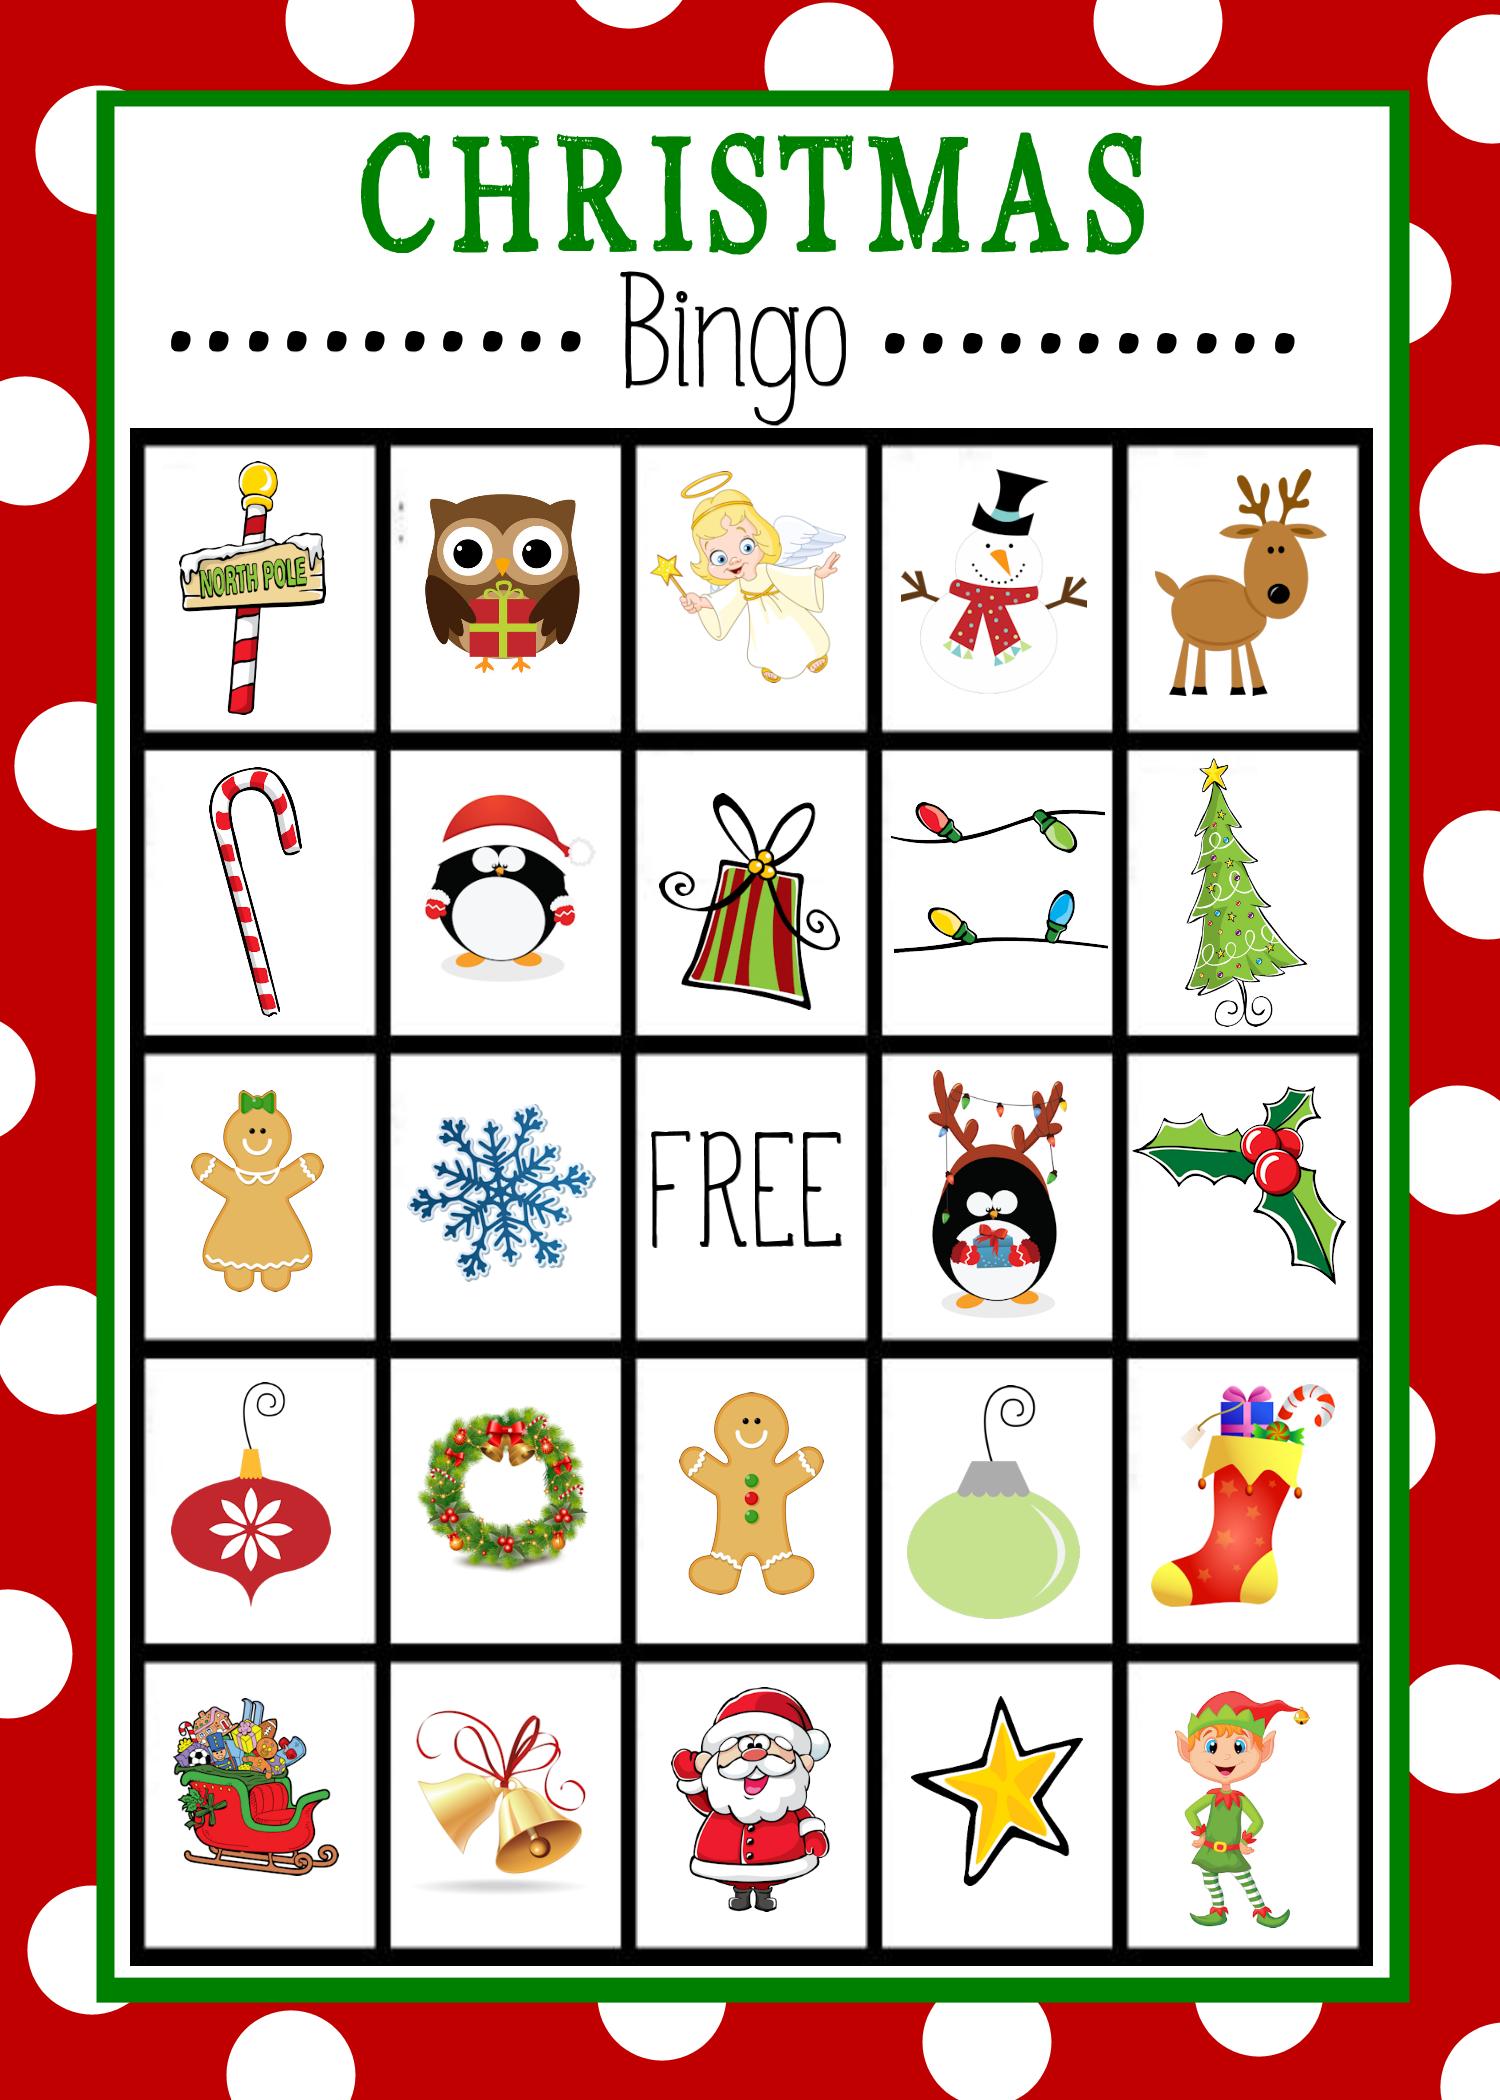 Free Printable Christmas Bingo Game - Kerstbingo, Kerst